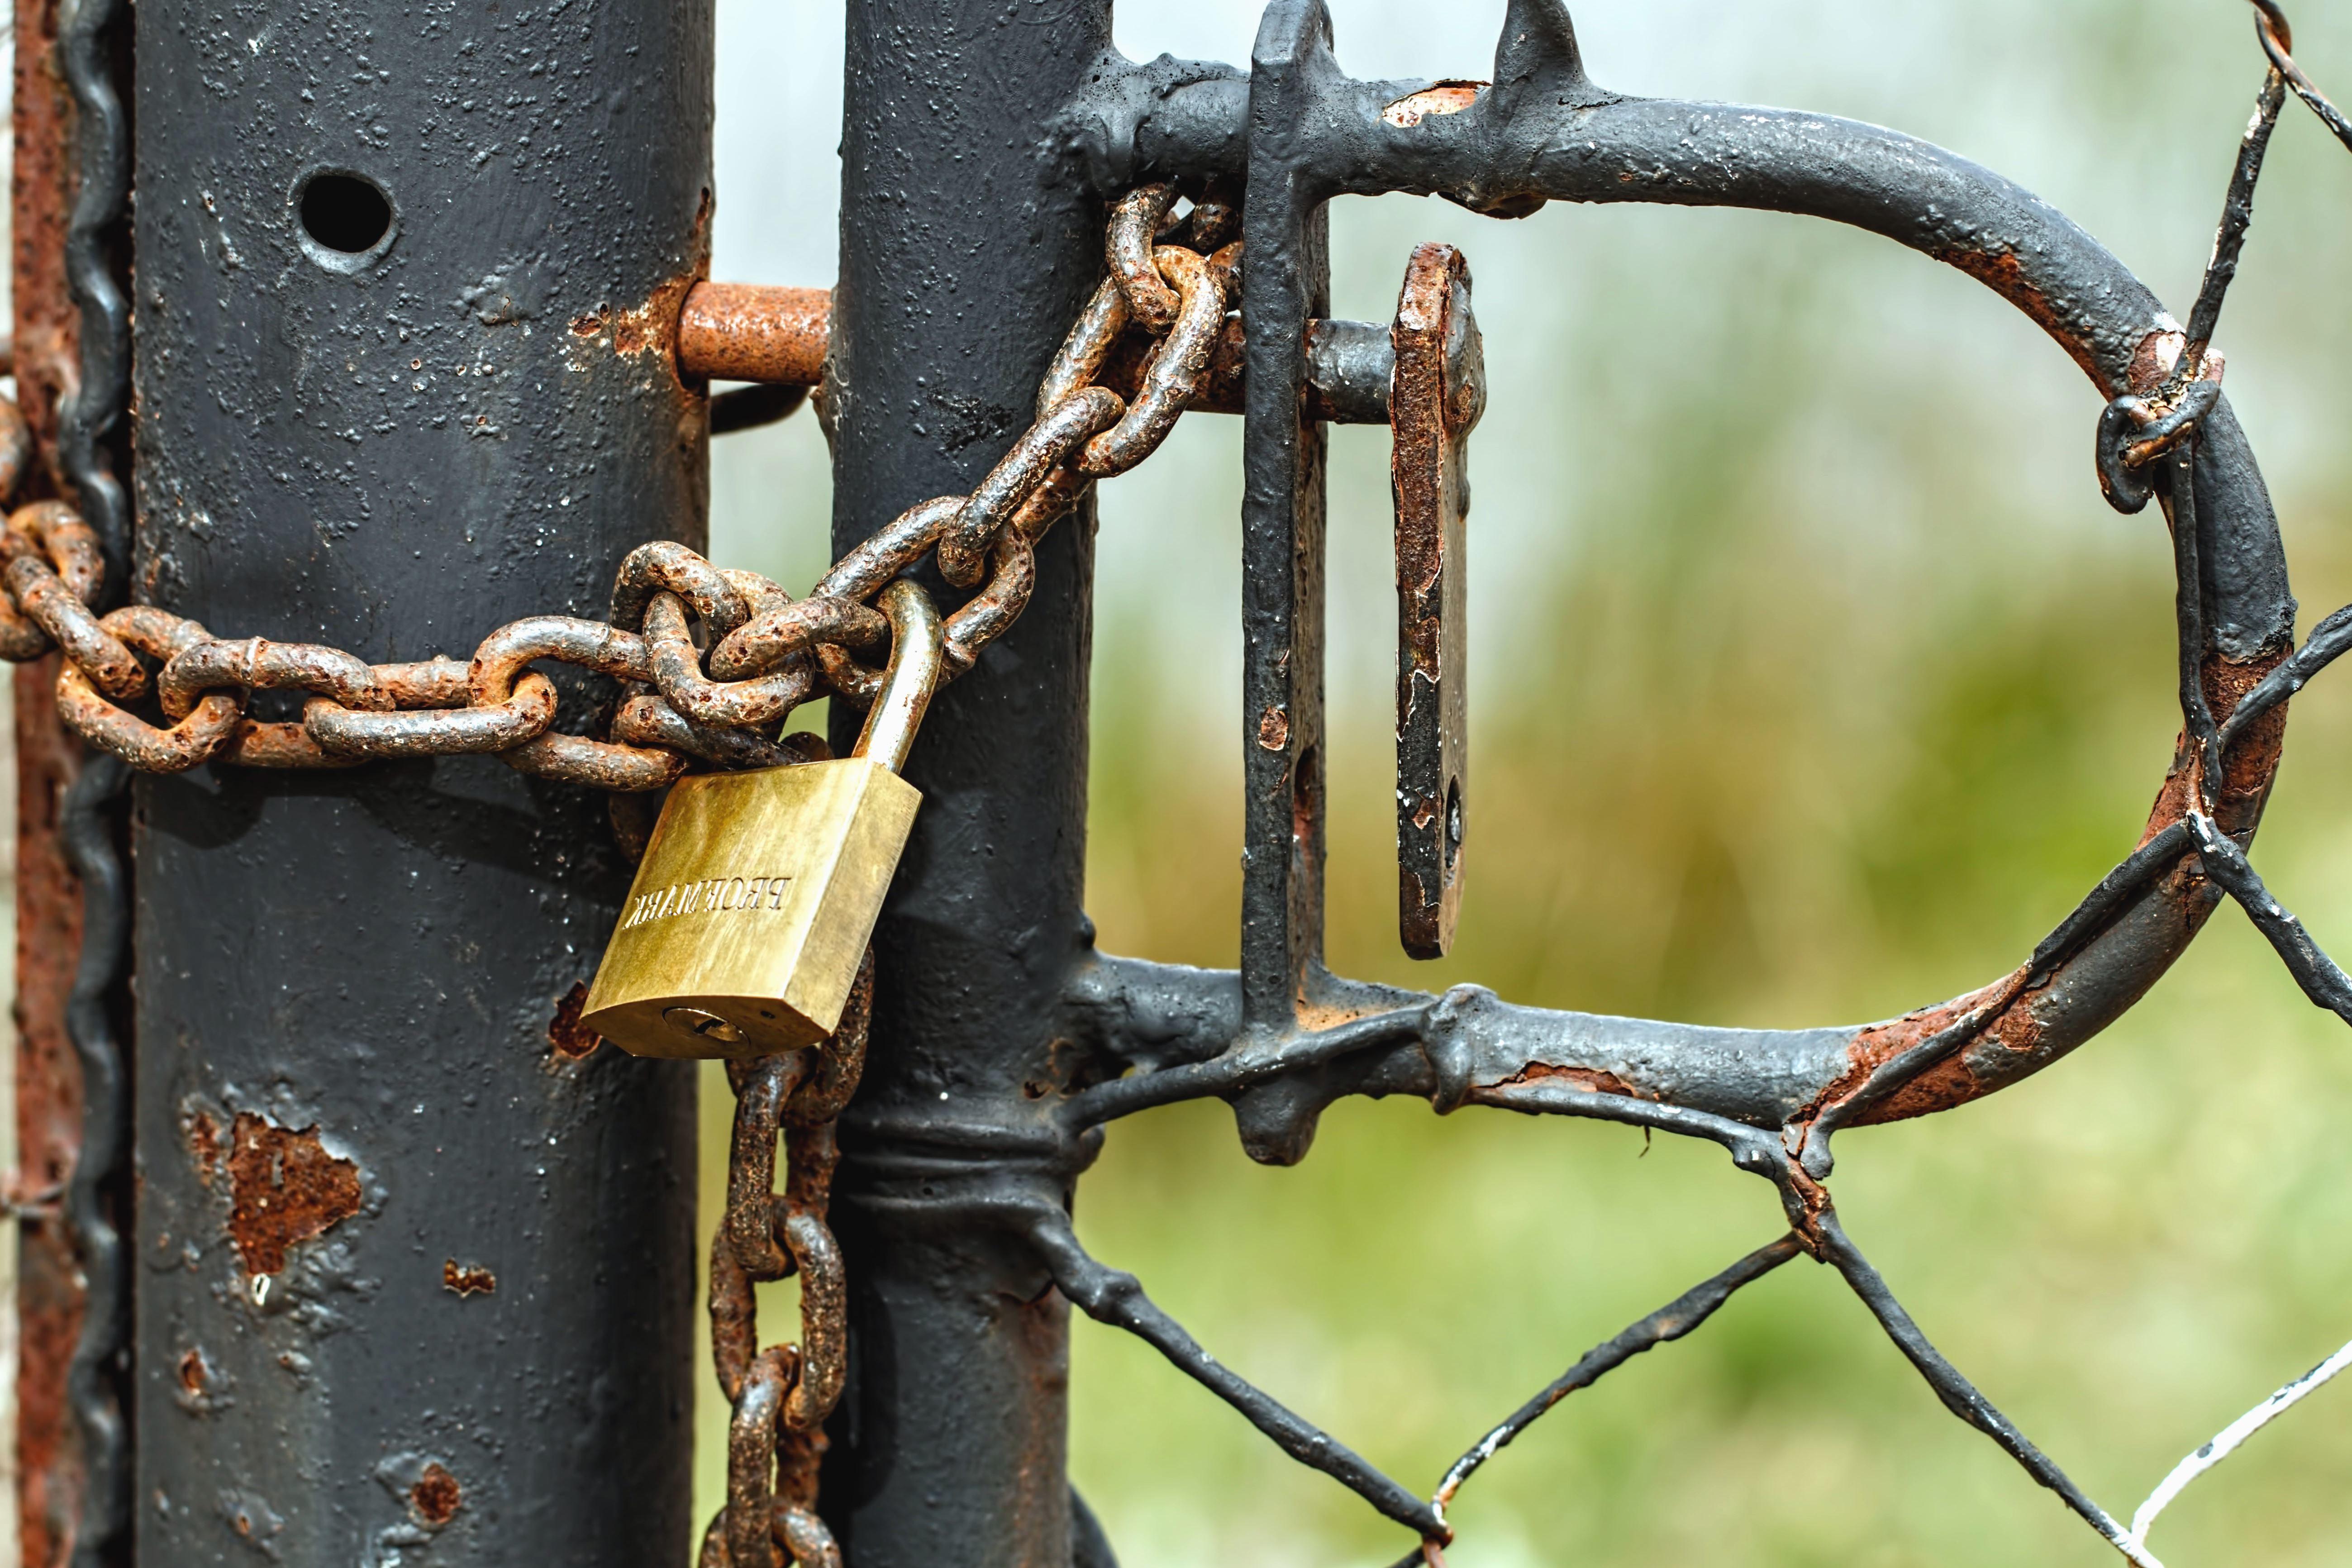 Kostenlose Bild: Tür, Zaun, Schloss, Draht, Kette, Metall